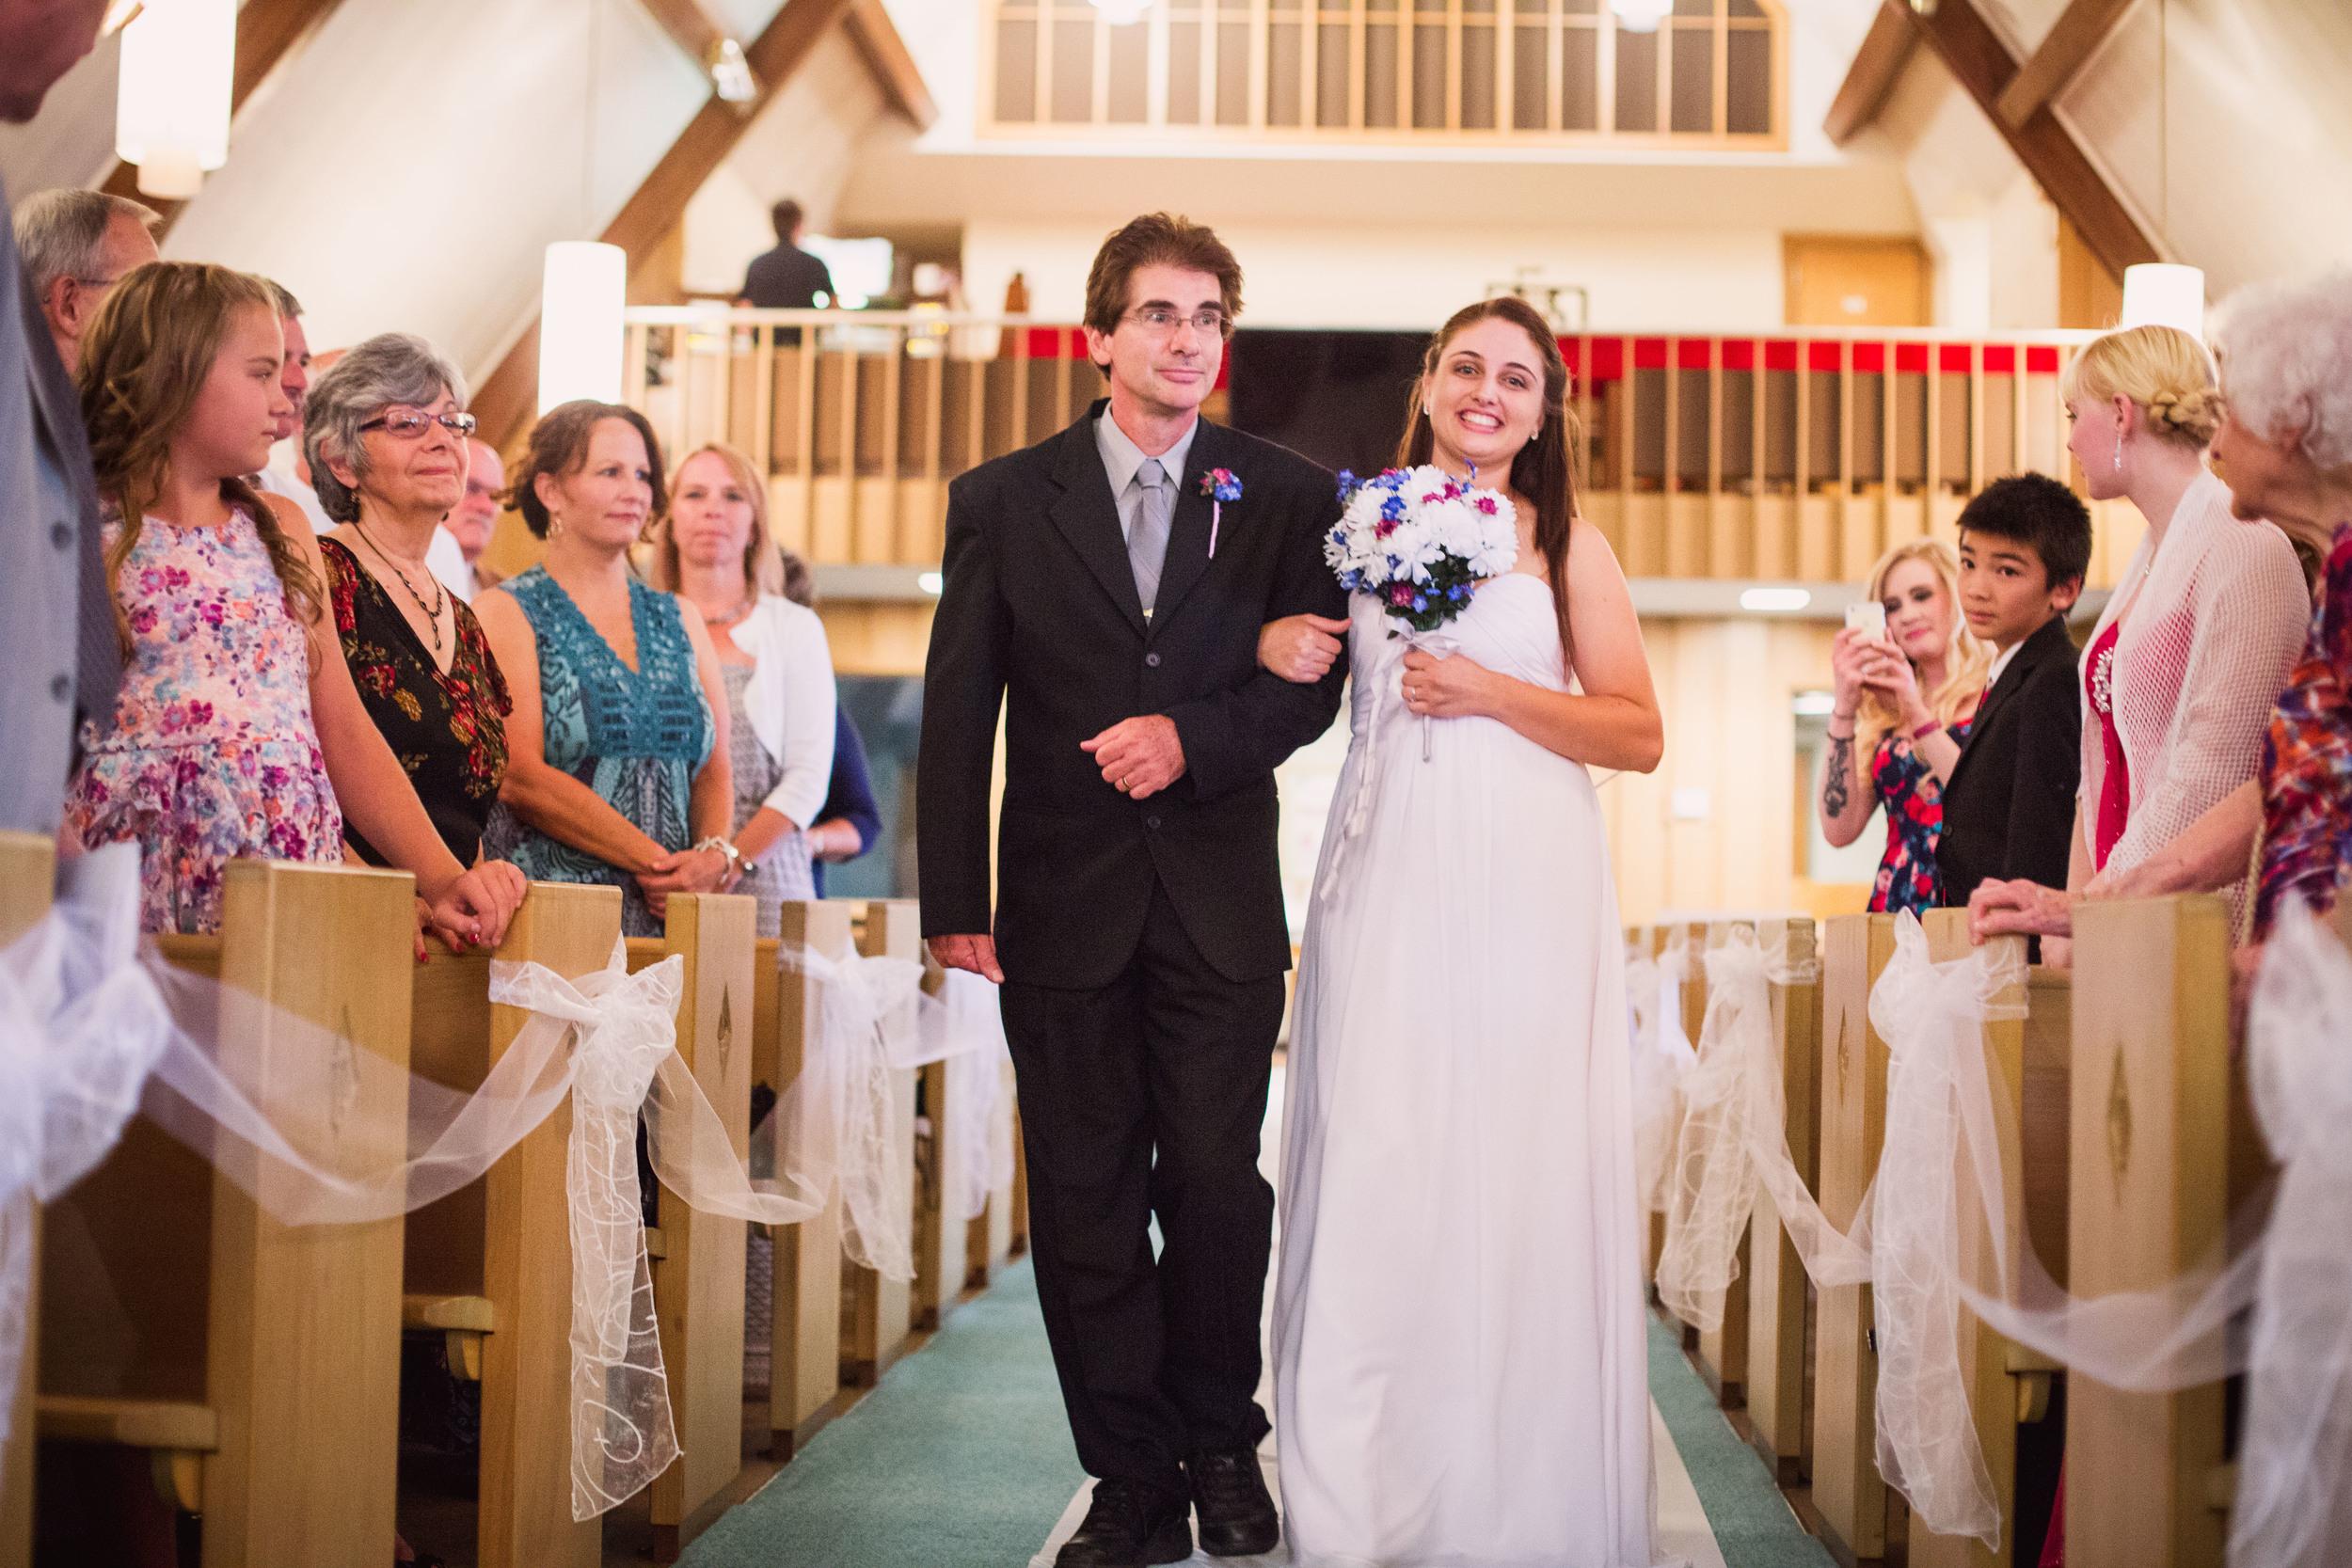 Stephanie-and-Mitchell-Buffalo-NY-Wedding-Stefan-Ludwig-Photography-113.jpg